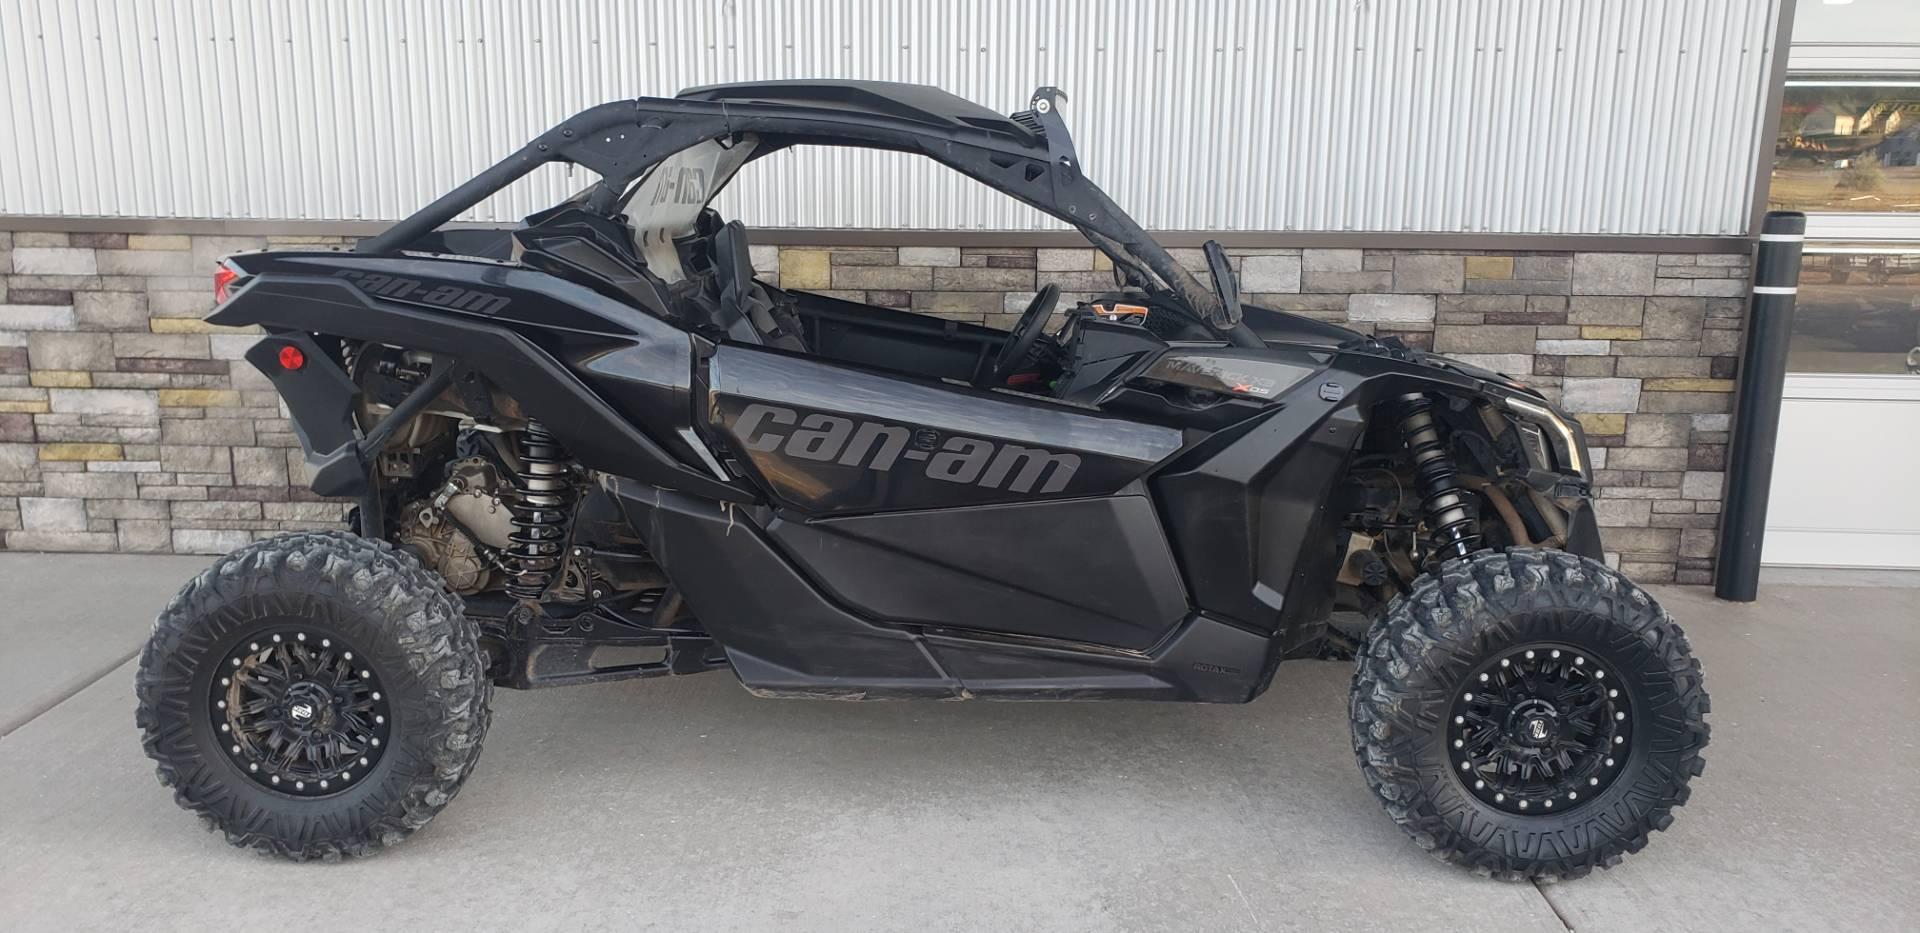 2017 Can-Am™ Maverick X3 X ds Turbo R 1